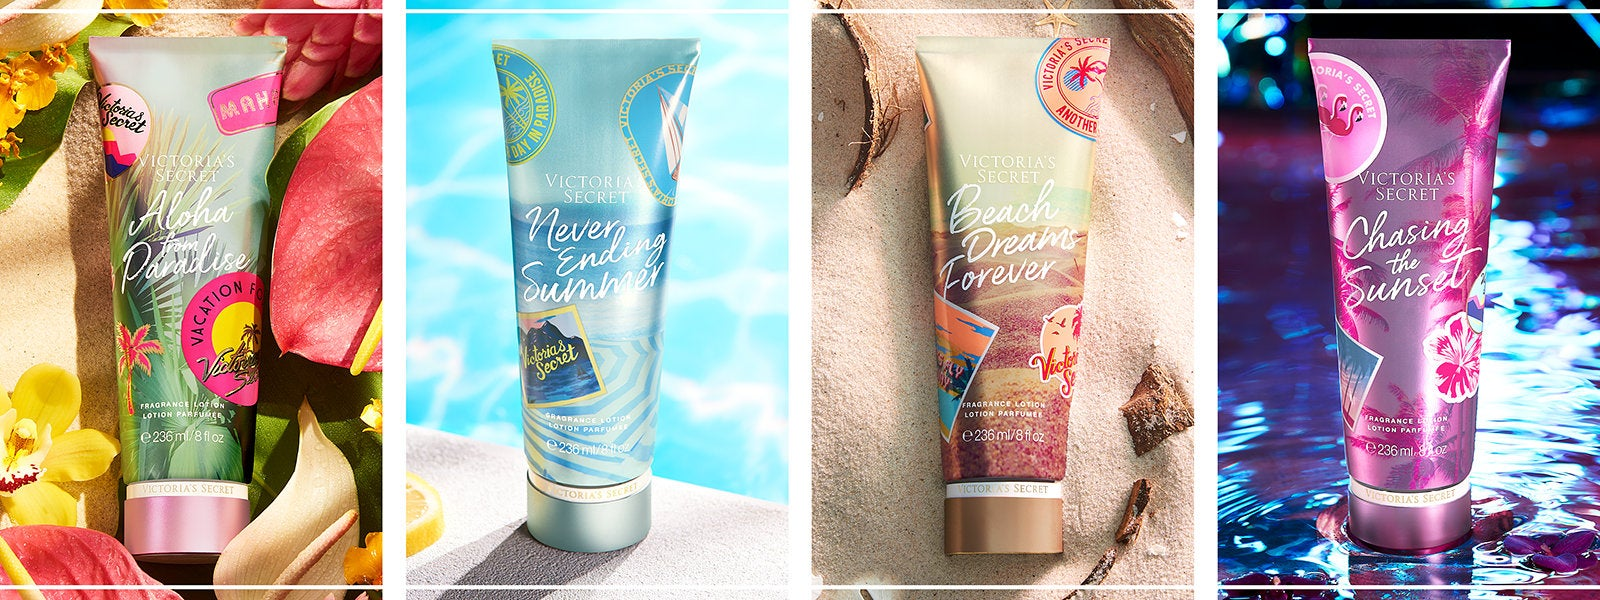 Victoria's Secret skincare products.